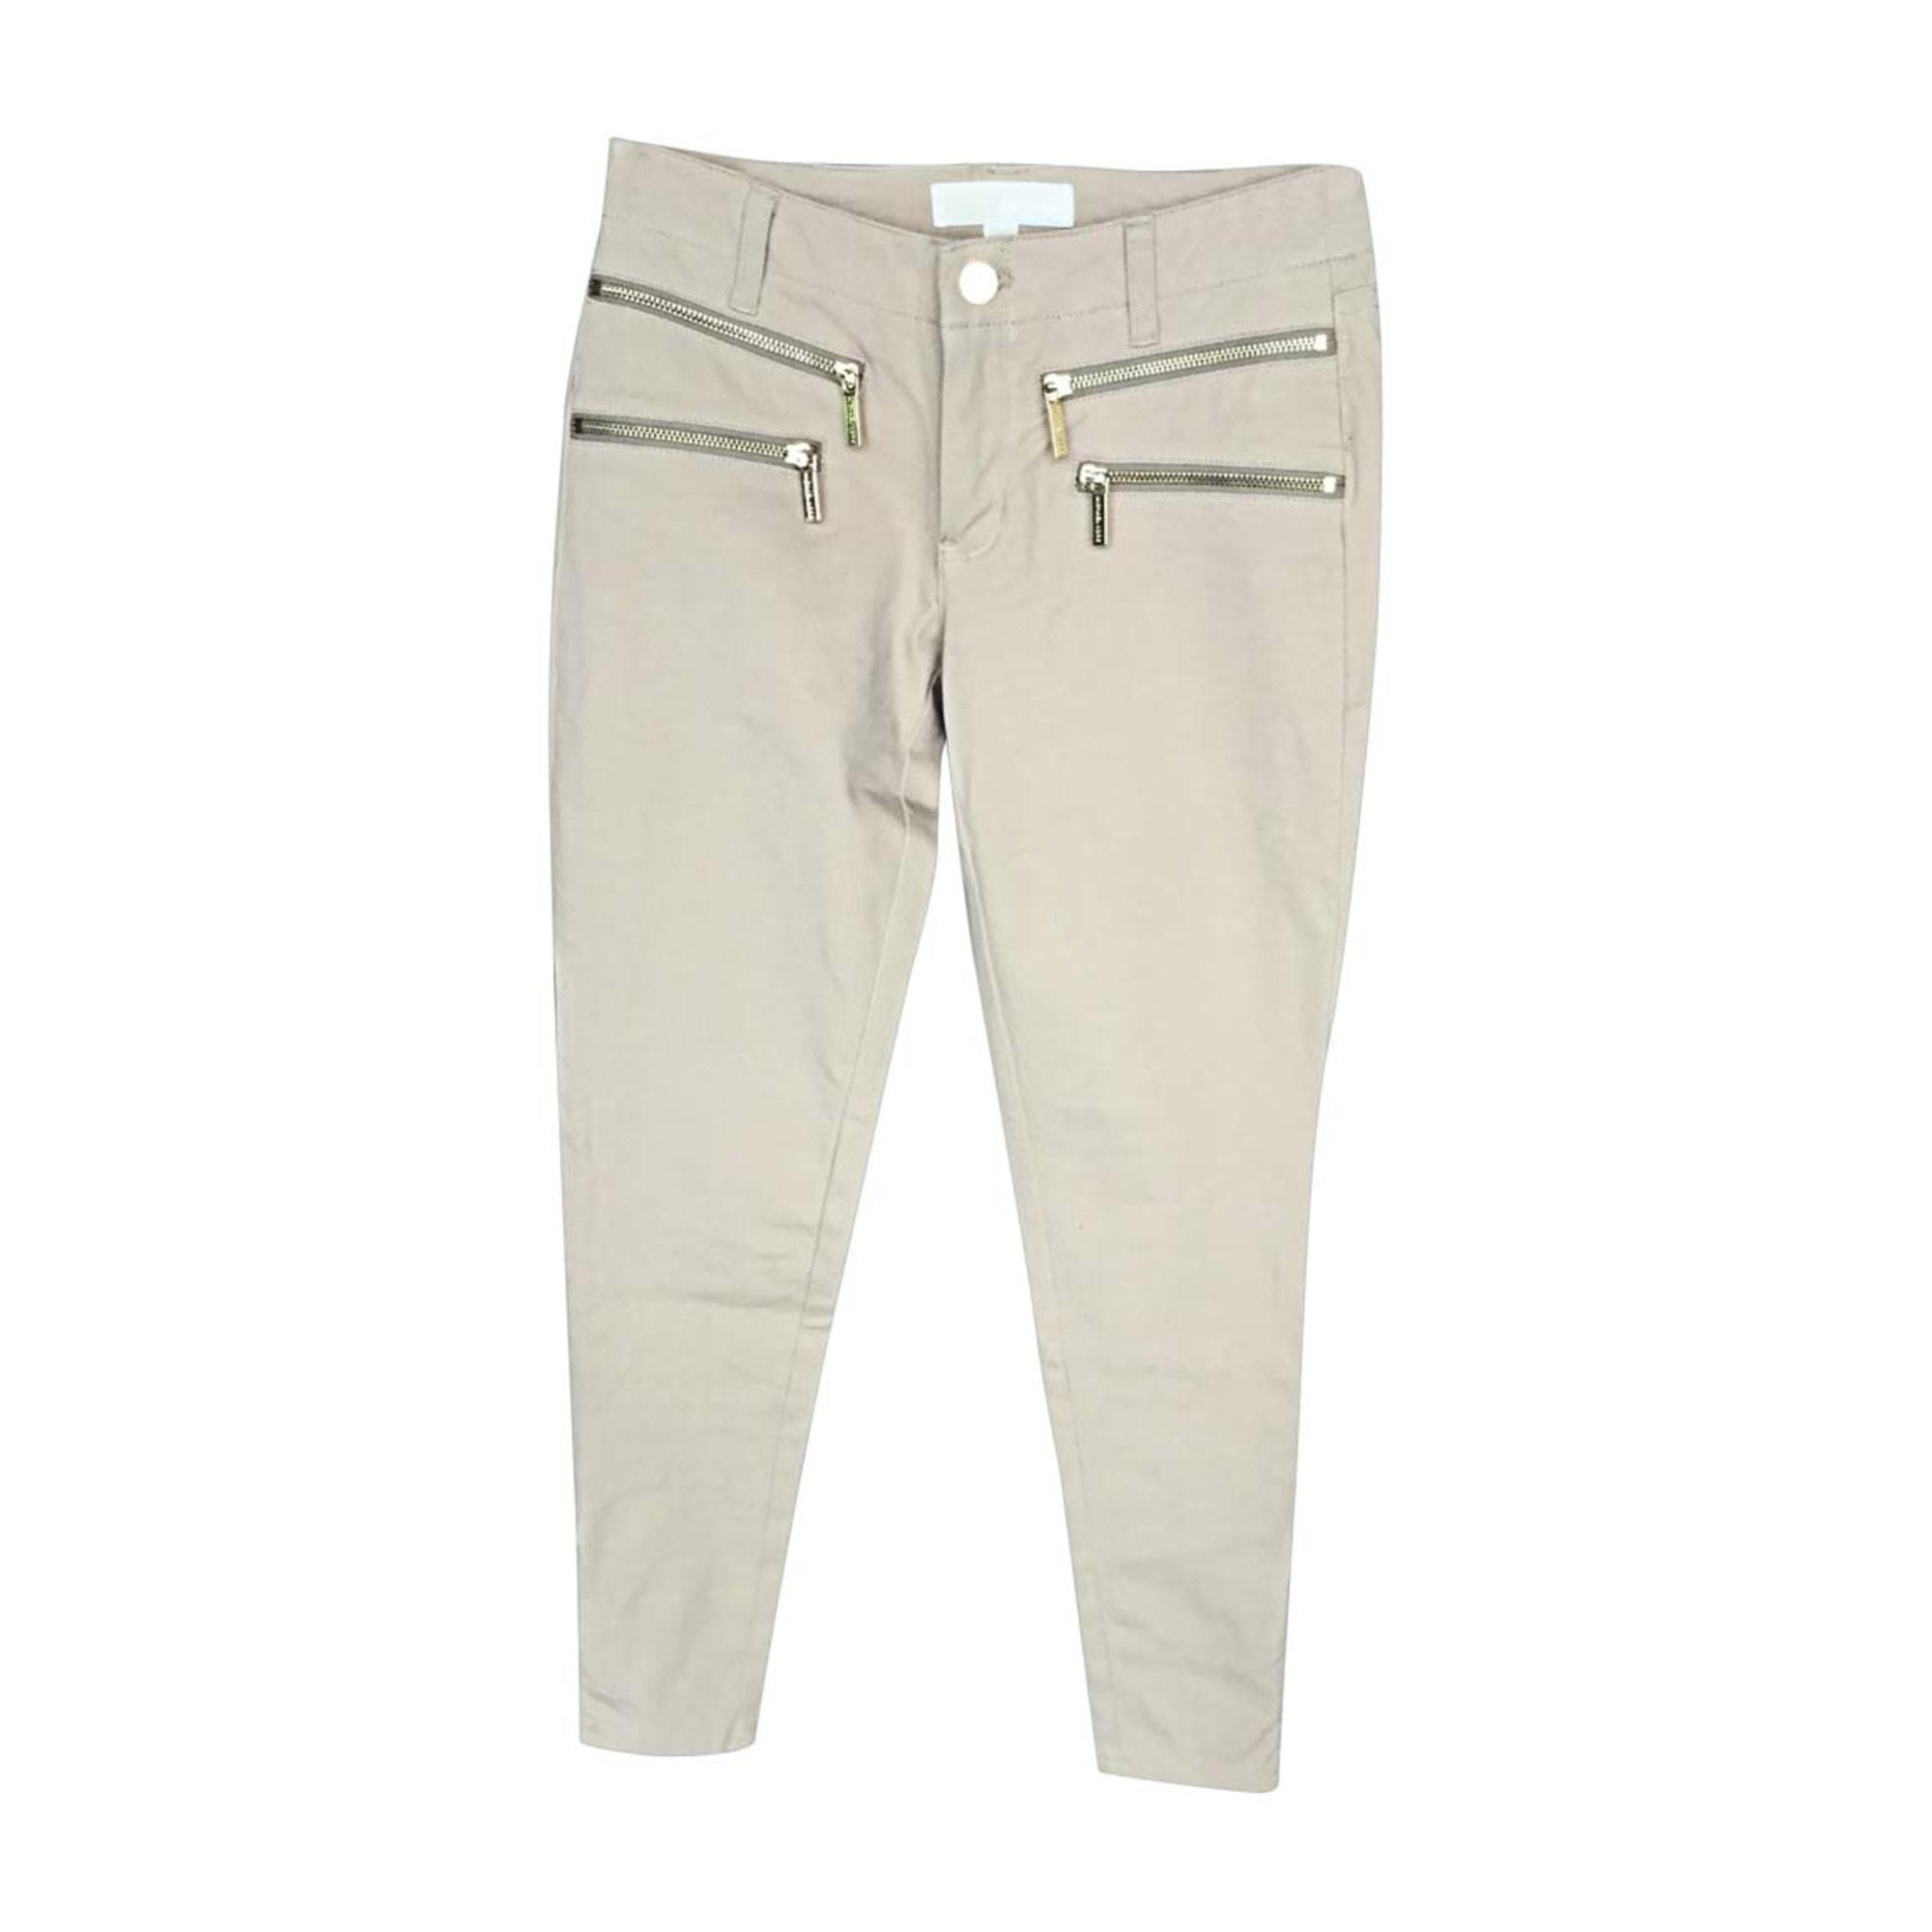 Pantalon slim, cigarette MICHAEL KORS Beige, camel